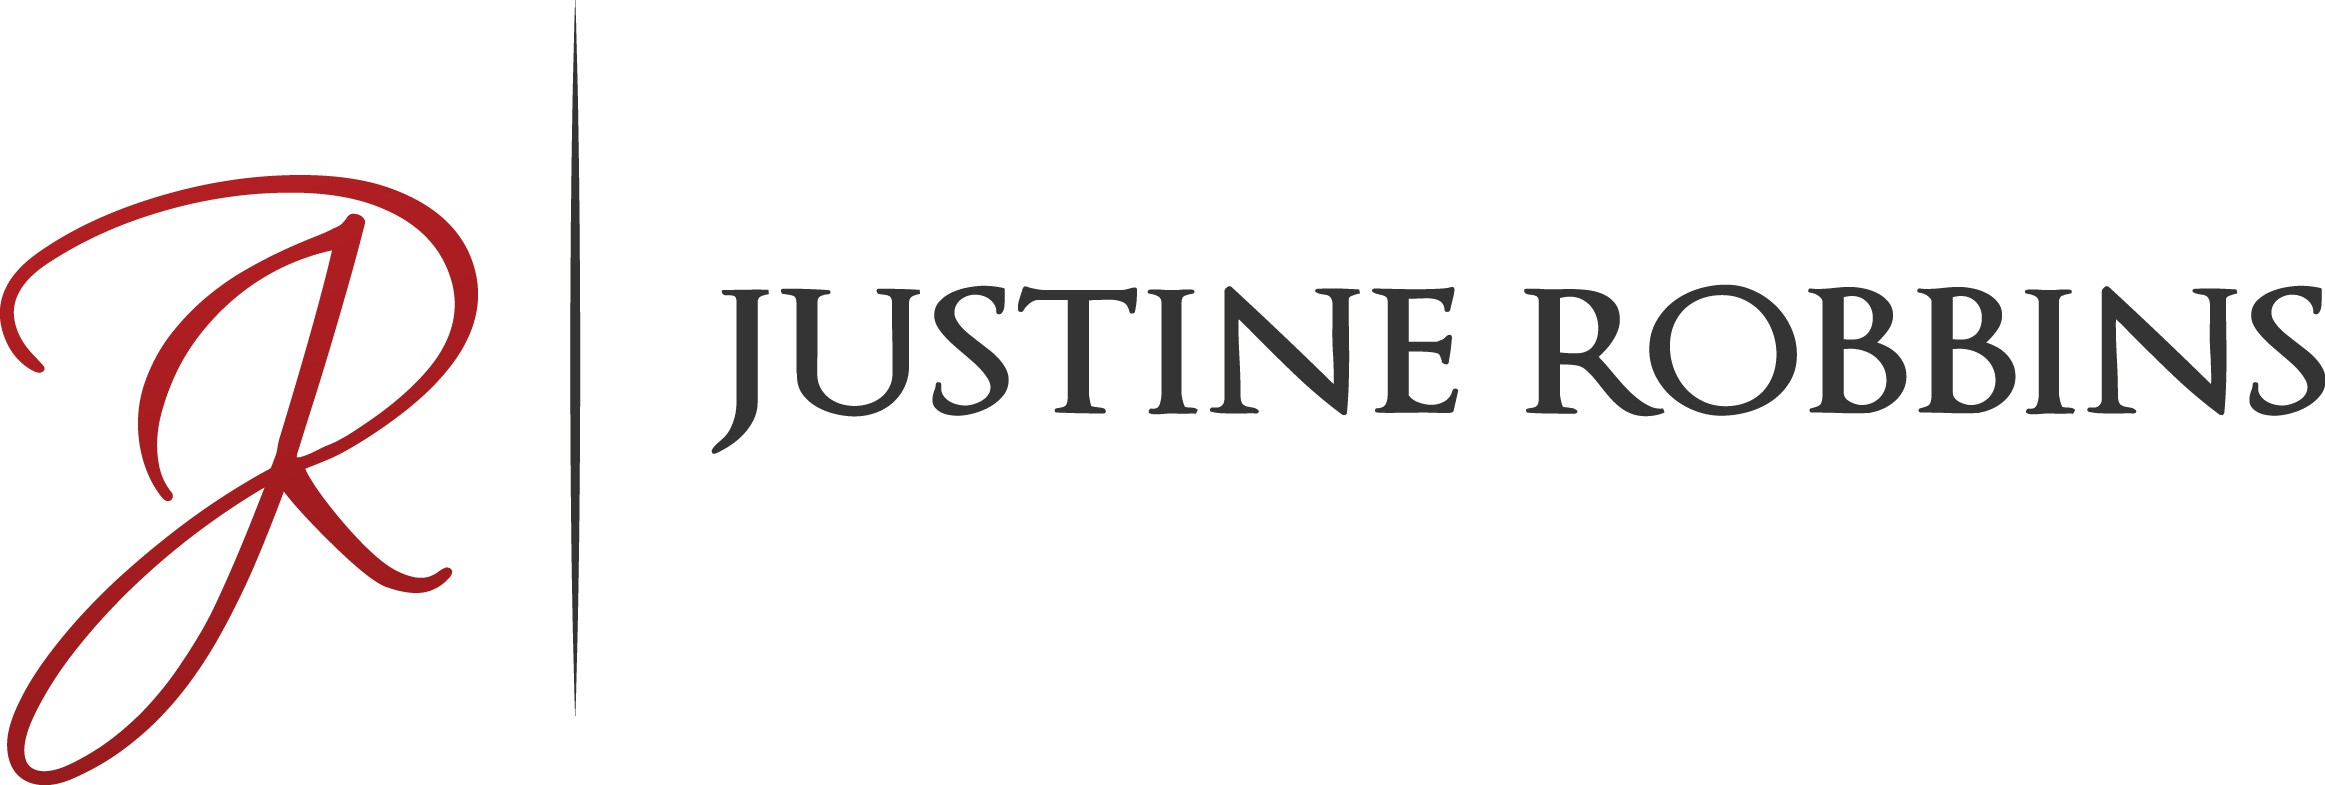 Justine Robbins Logo